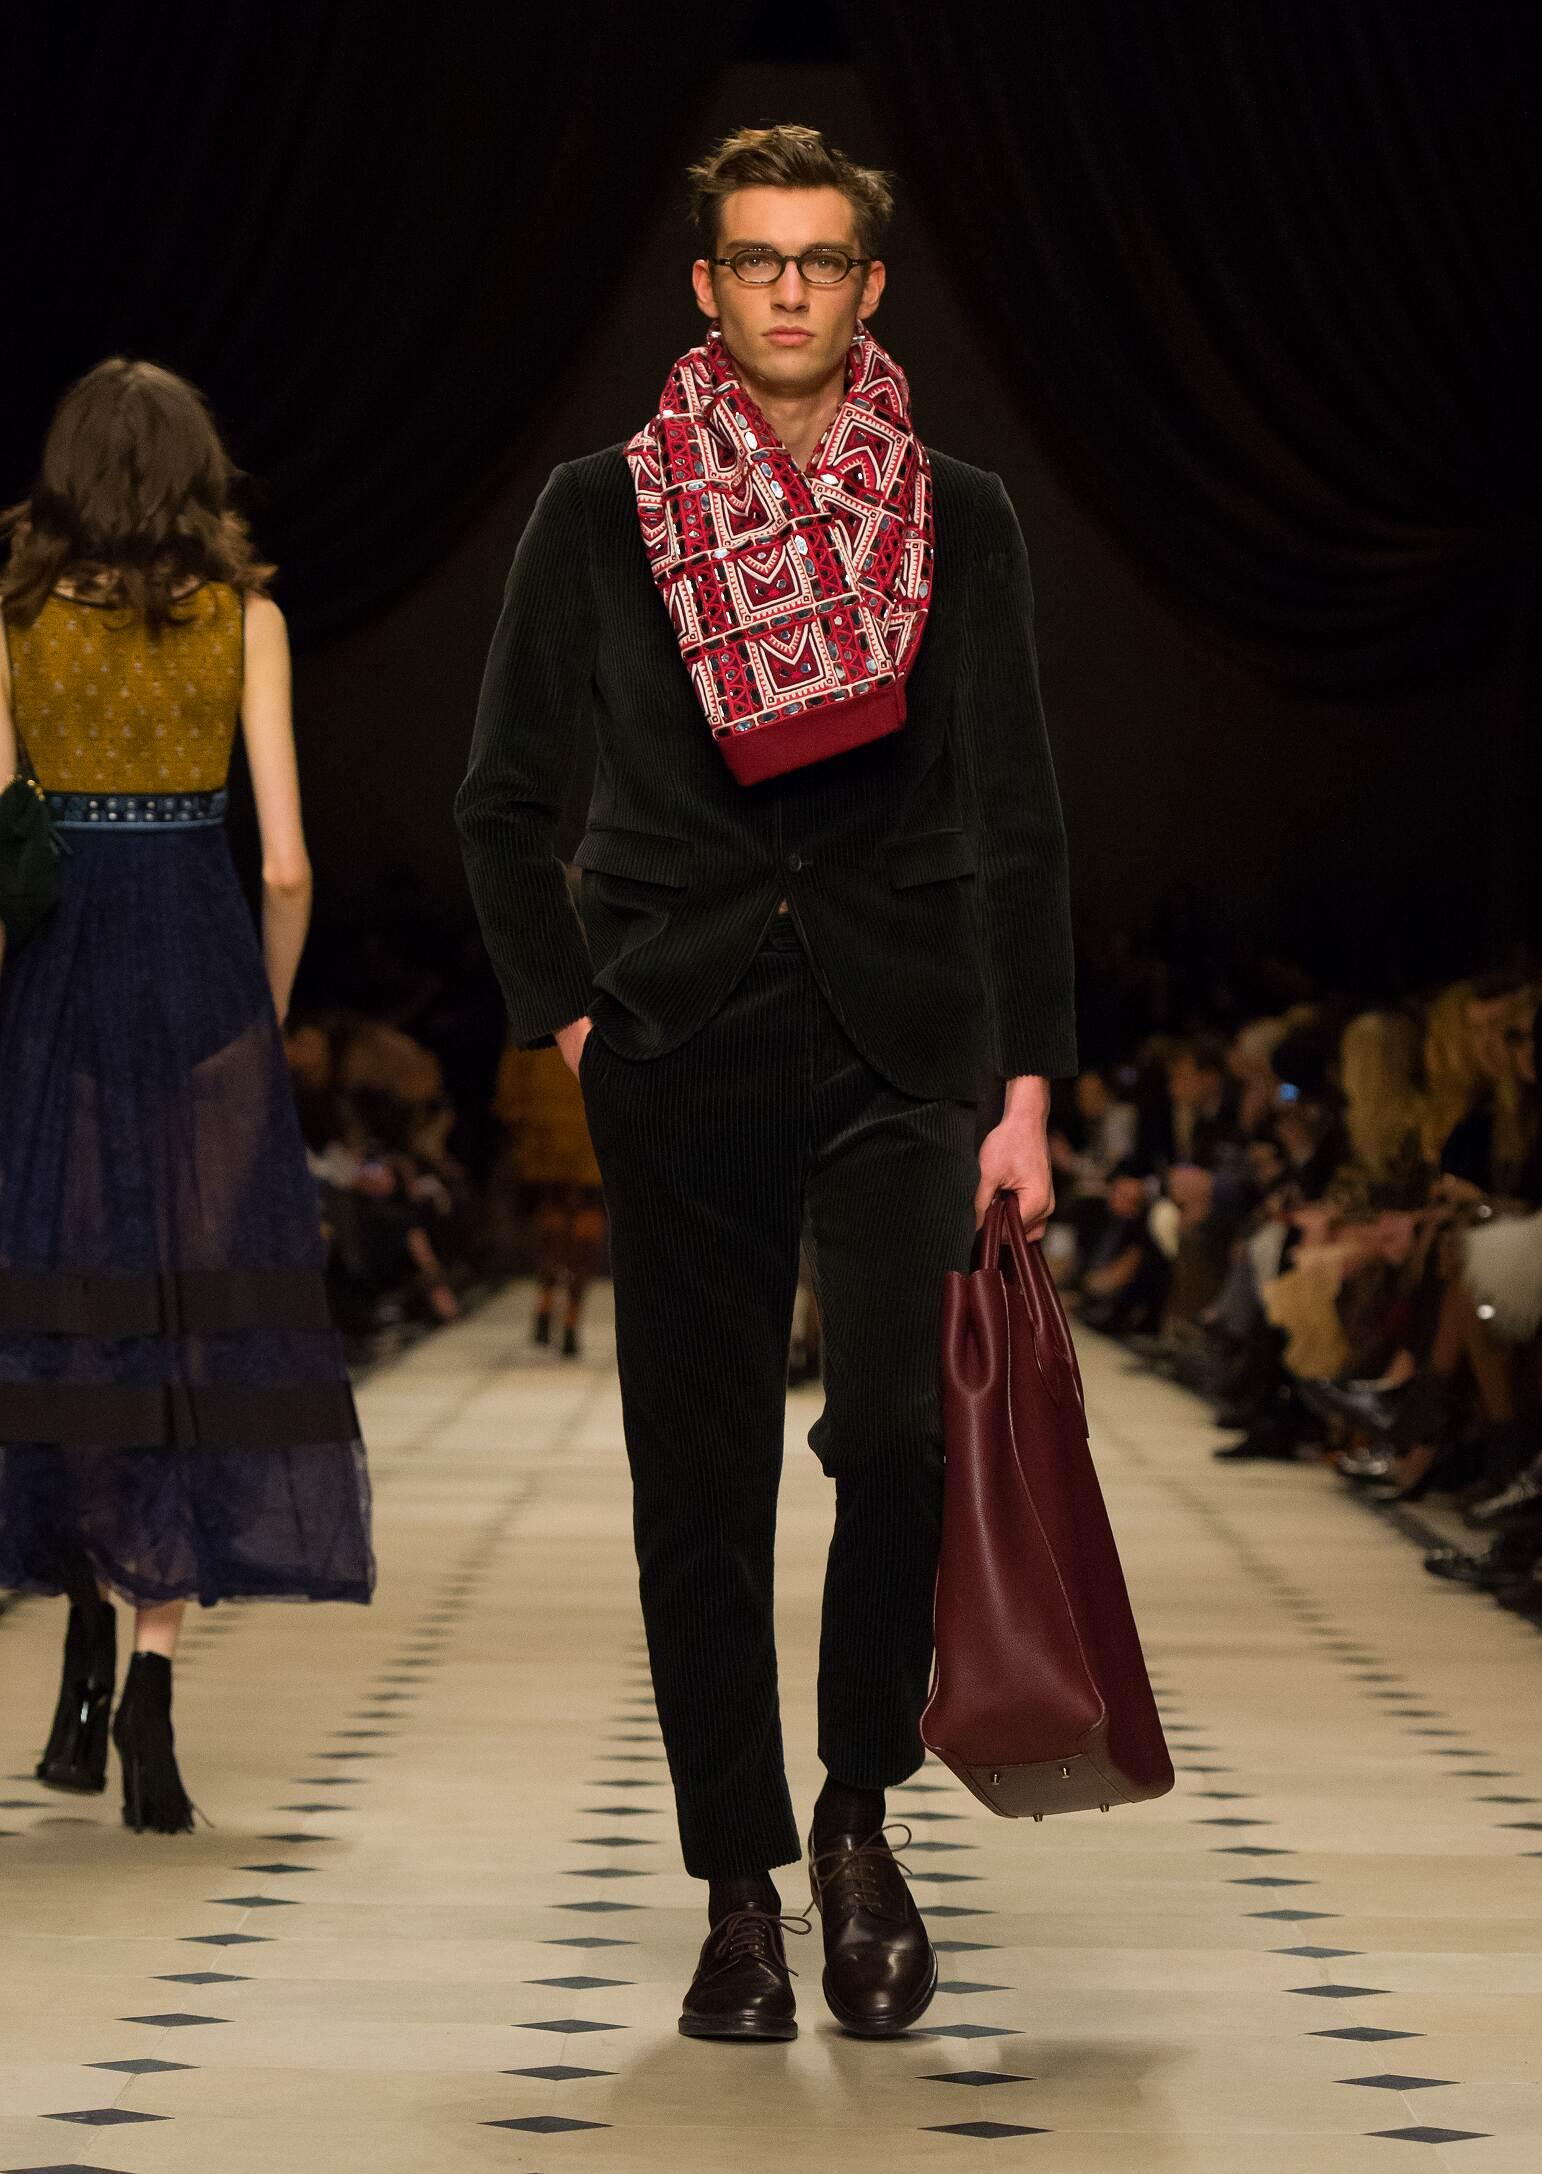 Fashion Show FW 2015 2016 Burberry Prorsum Menswear